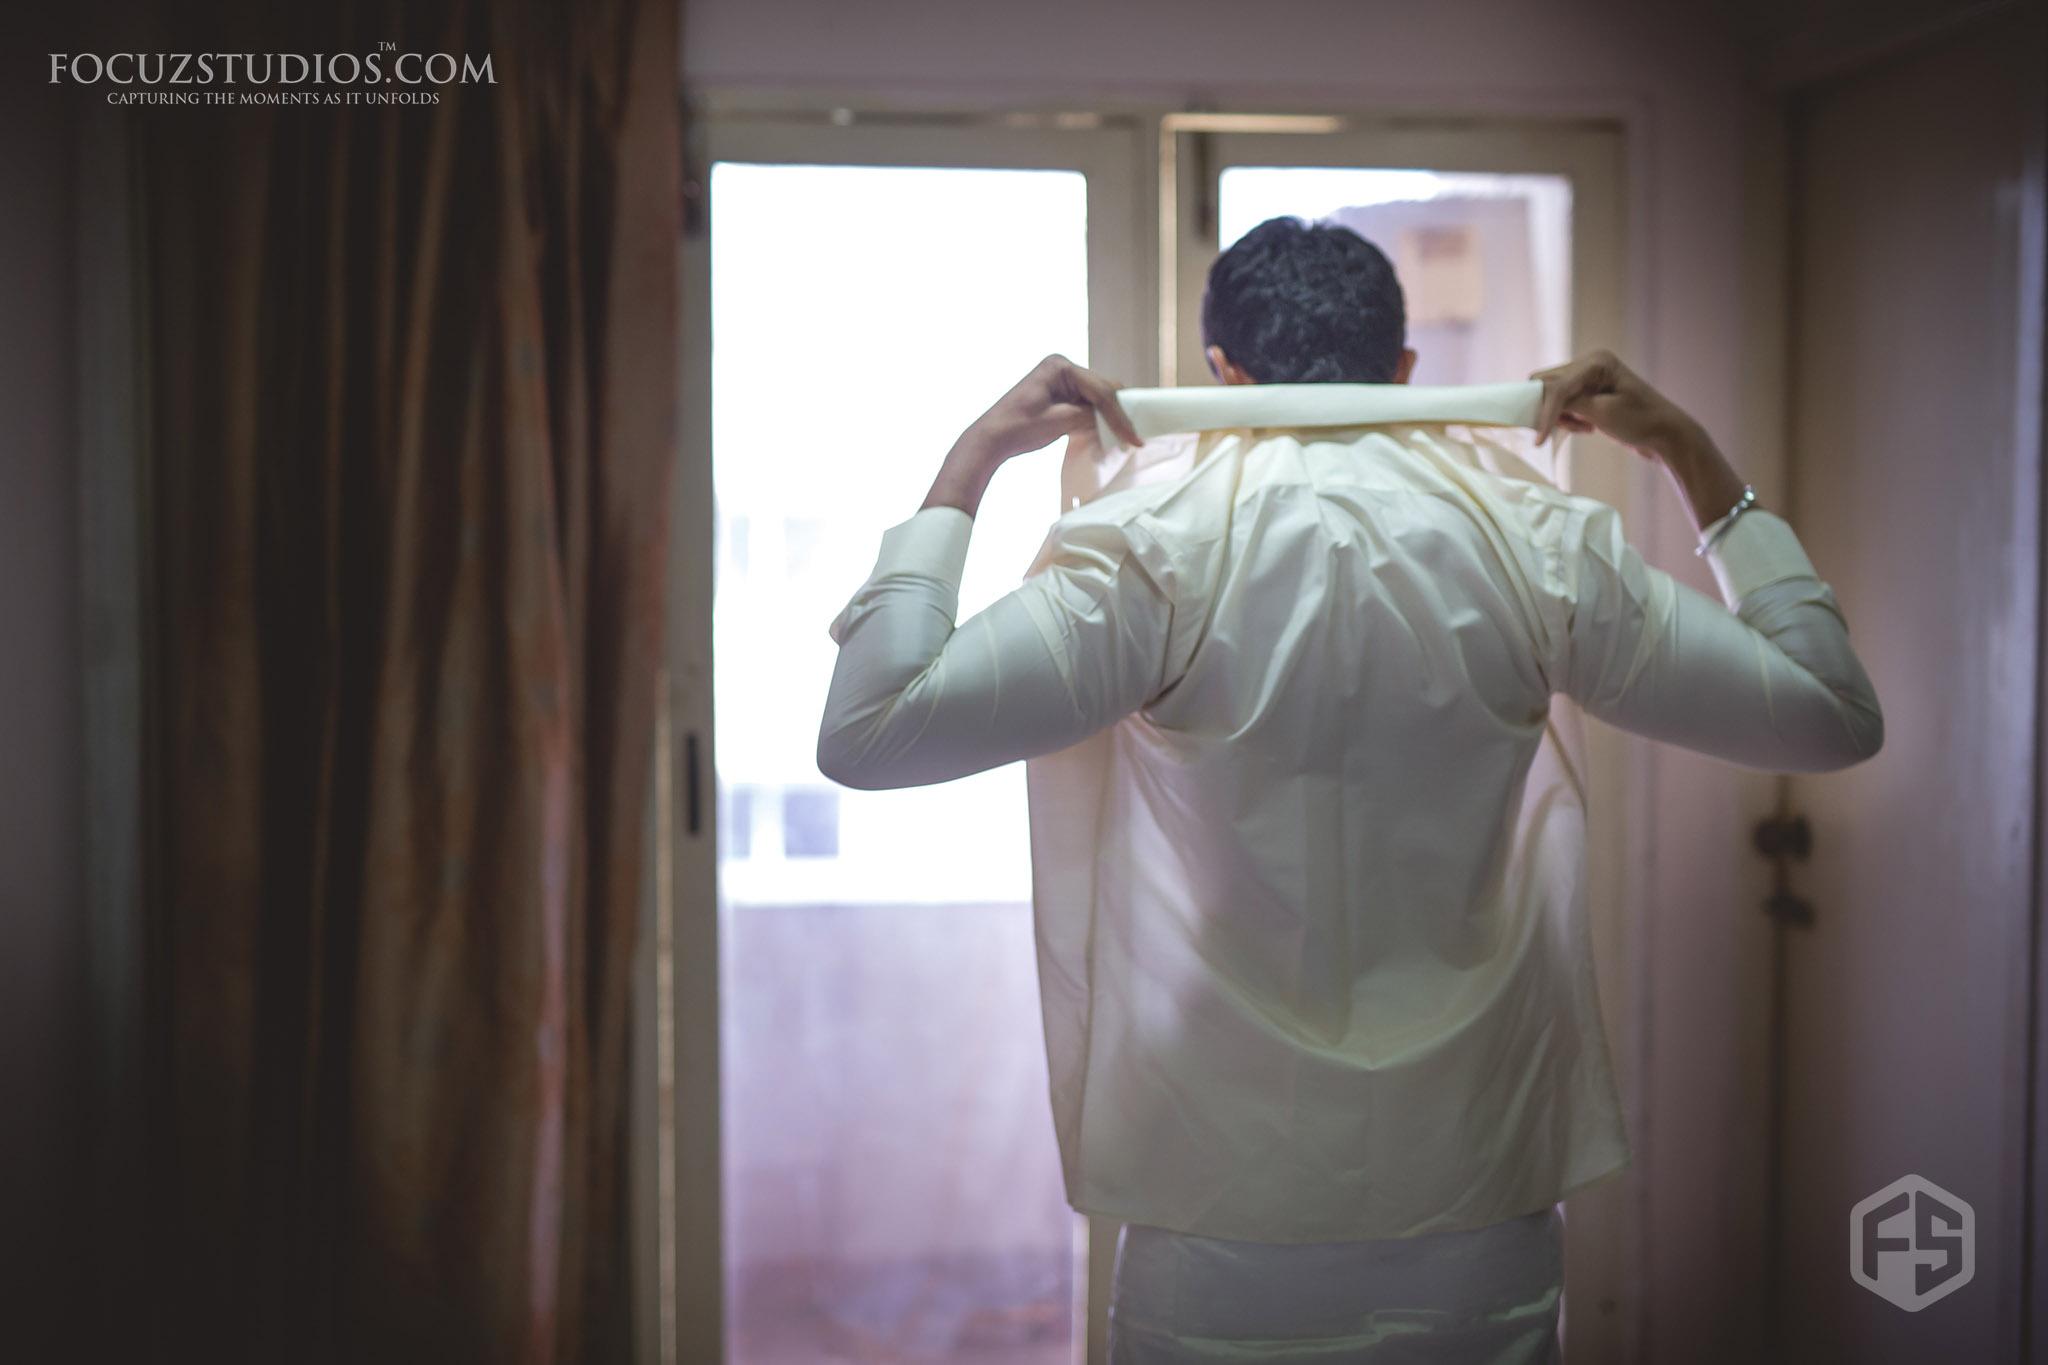 candid-photographers-in-trichy-tiruchirappalli-focuz-studios13